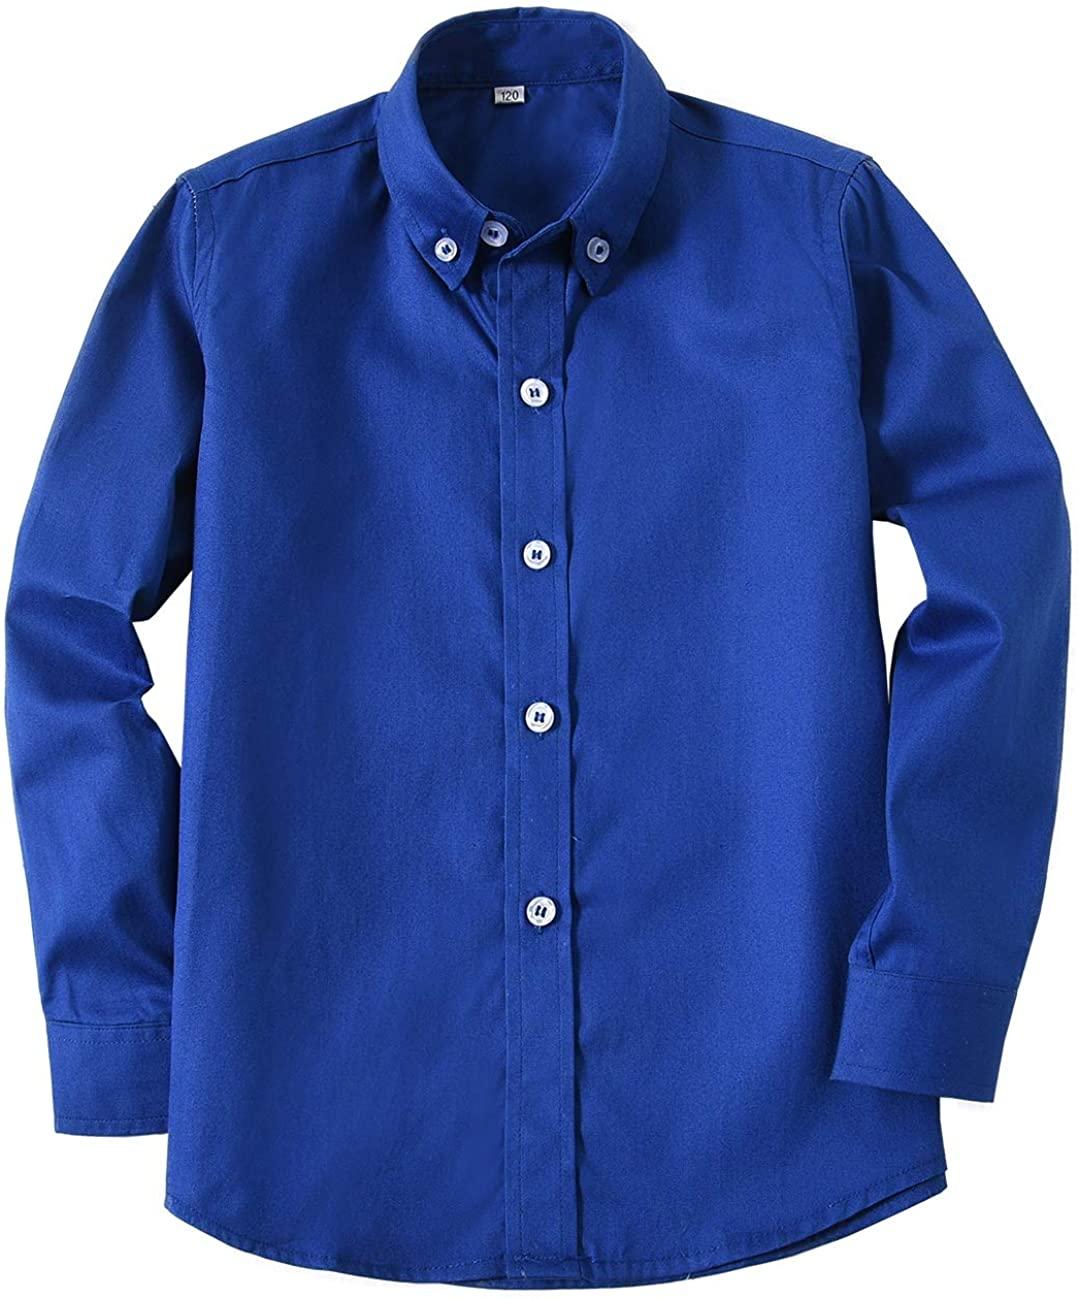 Edooli Boys' Long Sleeve Solid Button Down Dress Shirt